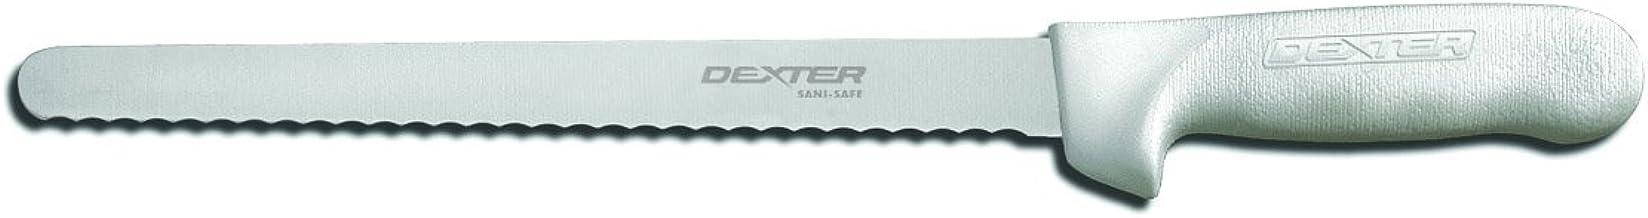 "Dexter Outdoors 10"" Narrow Scalloped Roast Slicer"